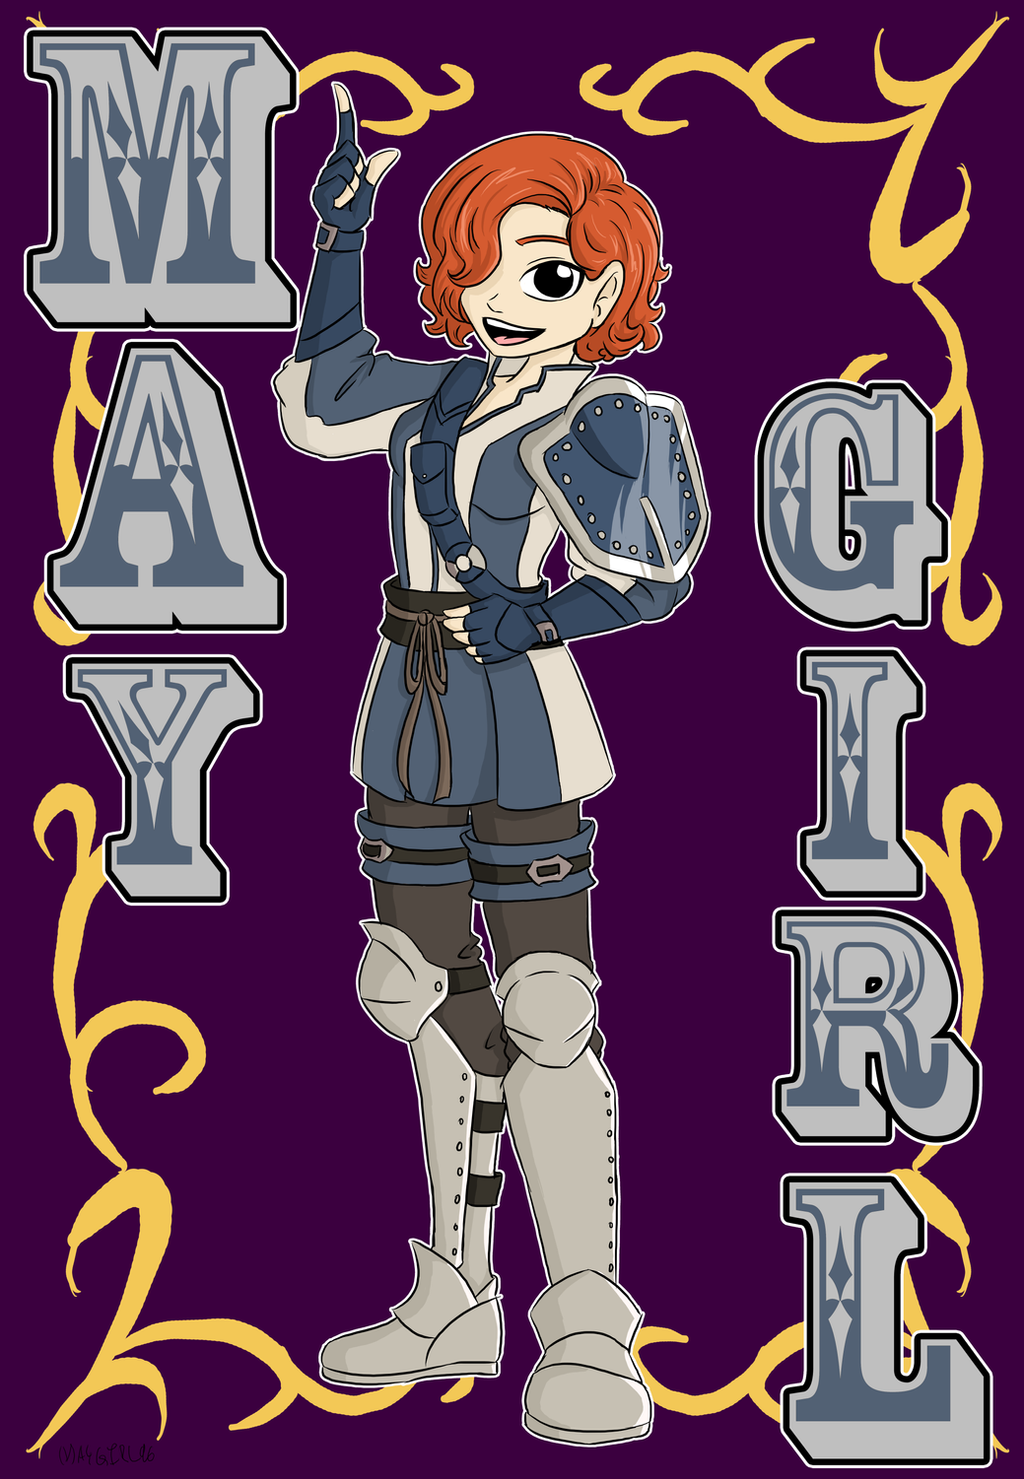 Maygirl96's Profile Picture